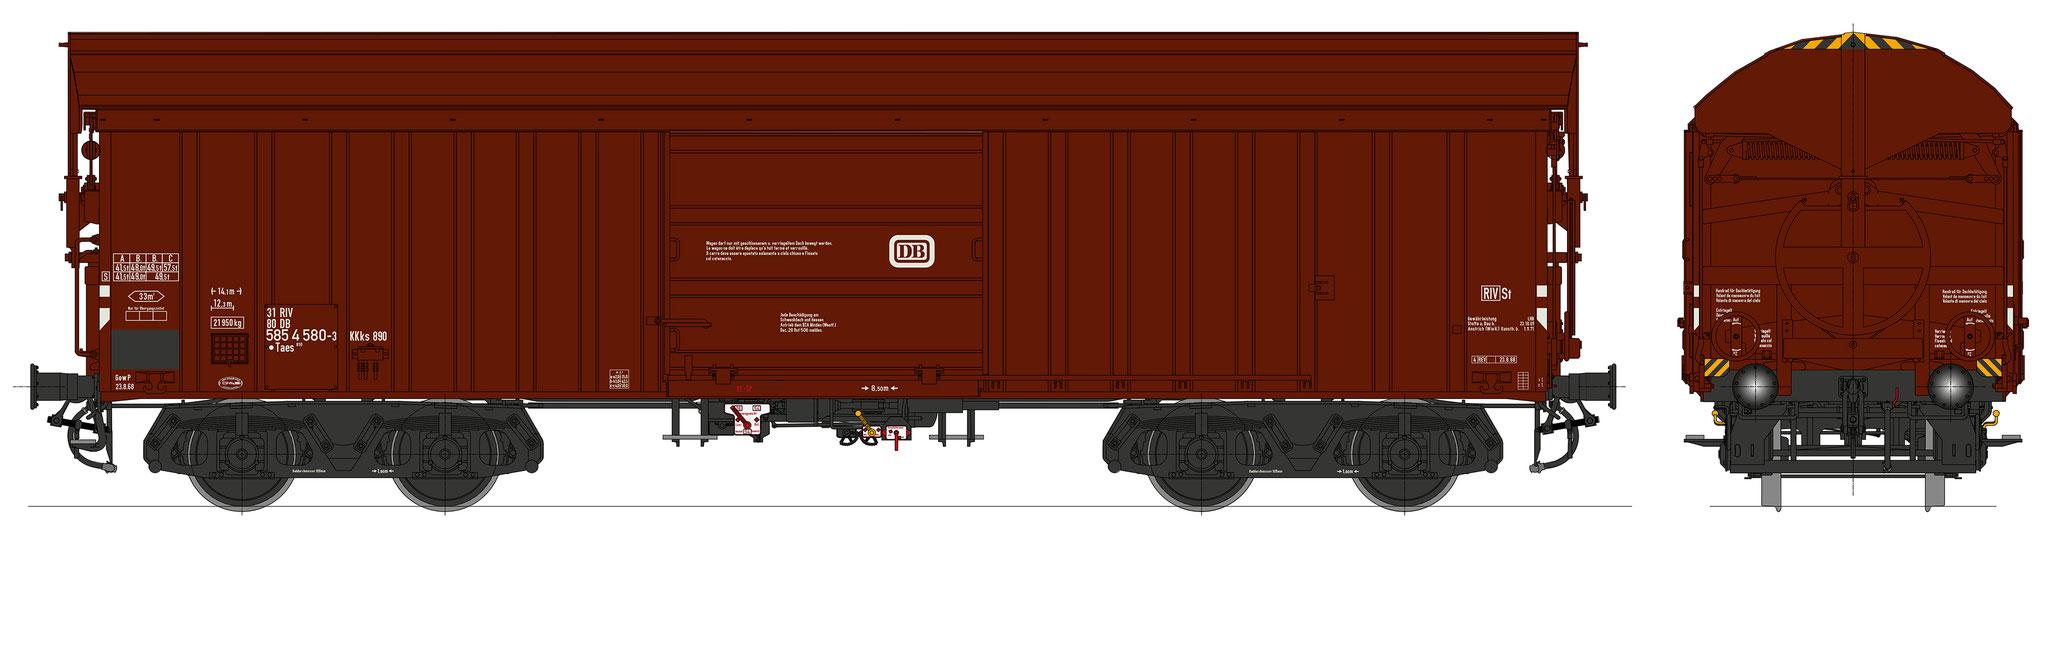 Bestell-Nr. 16062, Ep. 3b/4a, Fahrgestell schwarz